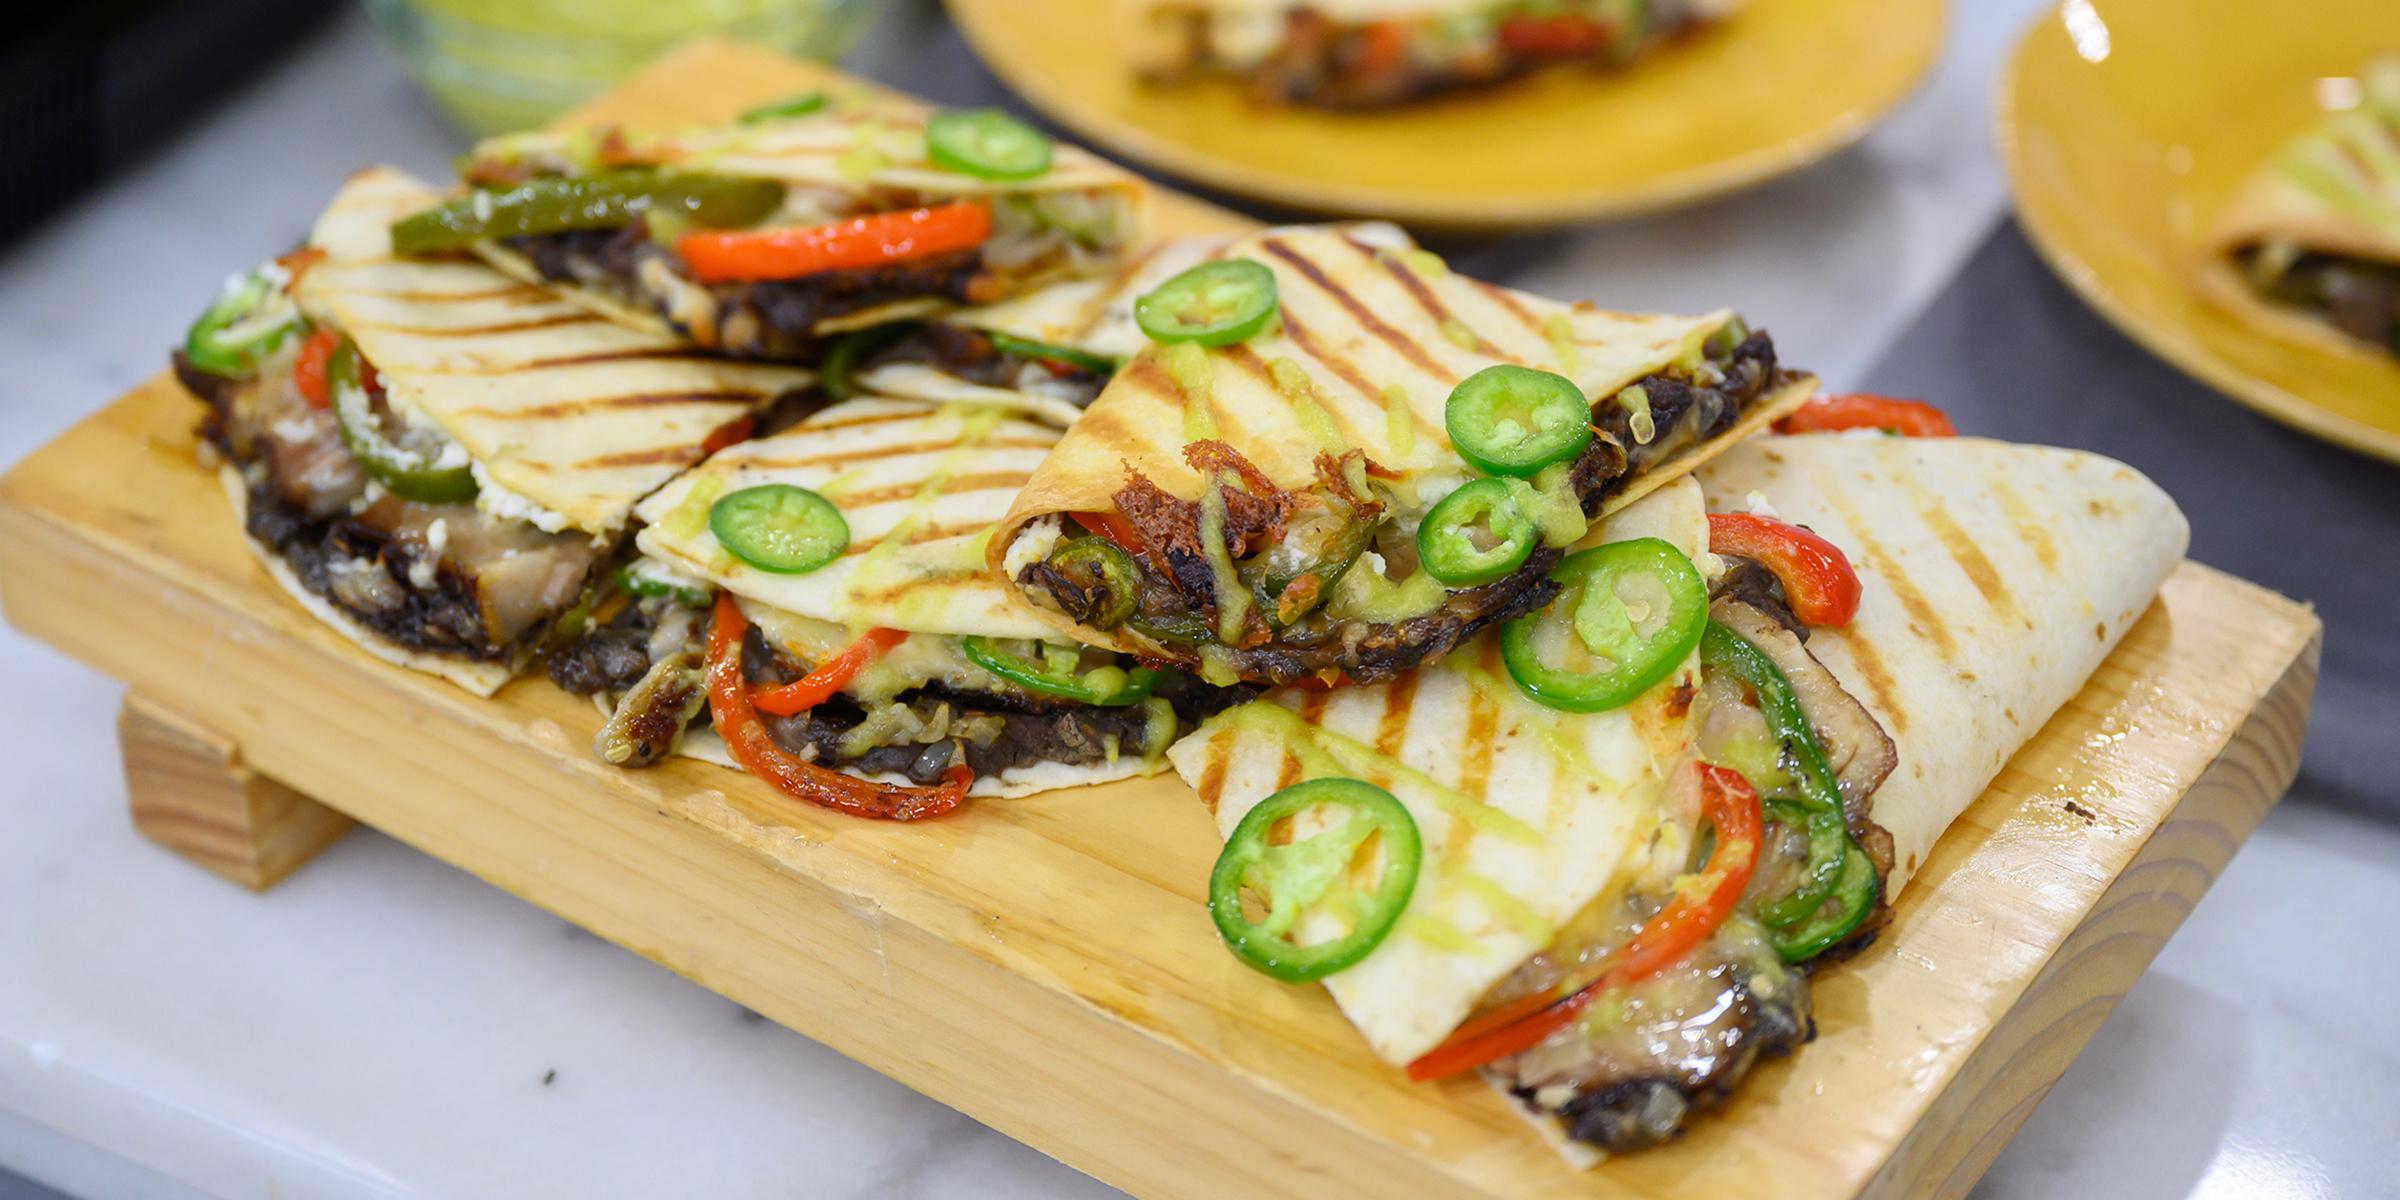 Quesadillas w/ Creamy Goat Cheese And Tender Braised Pork